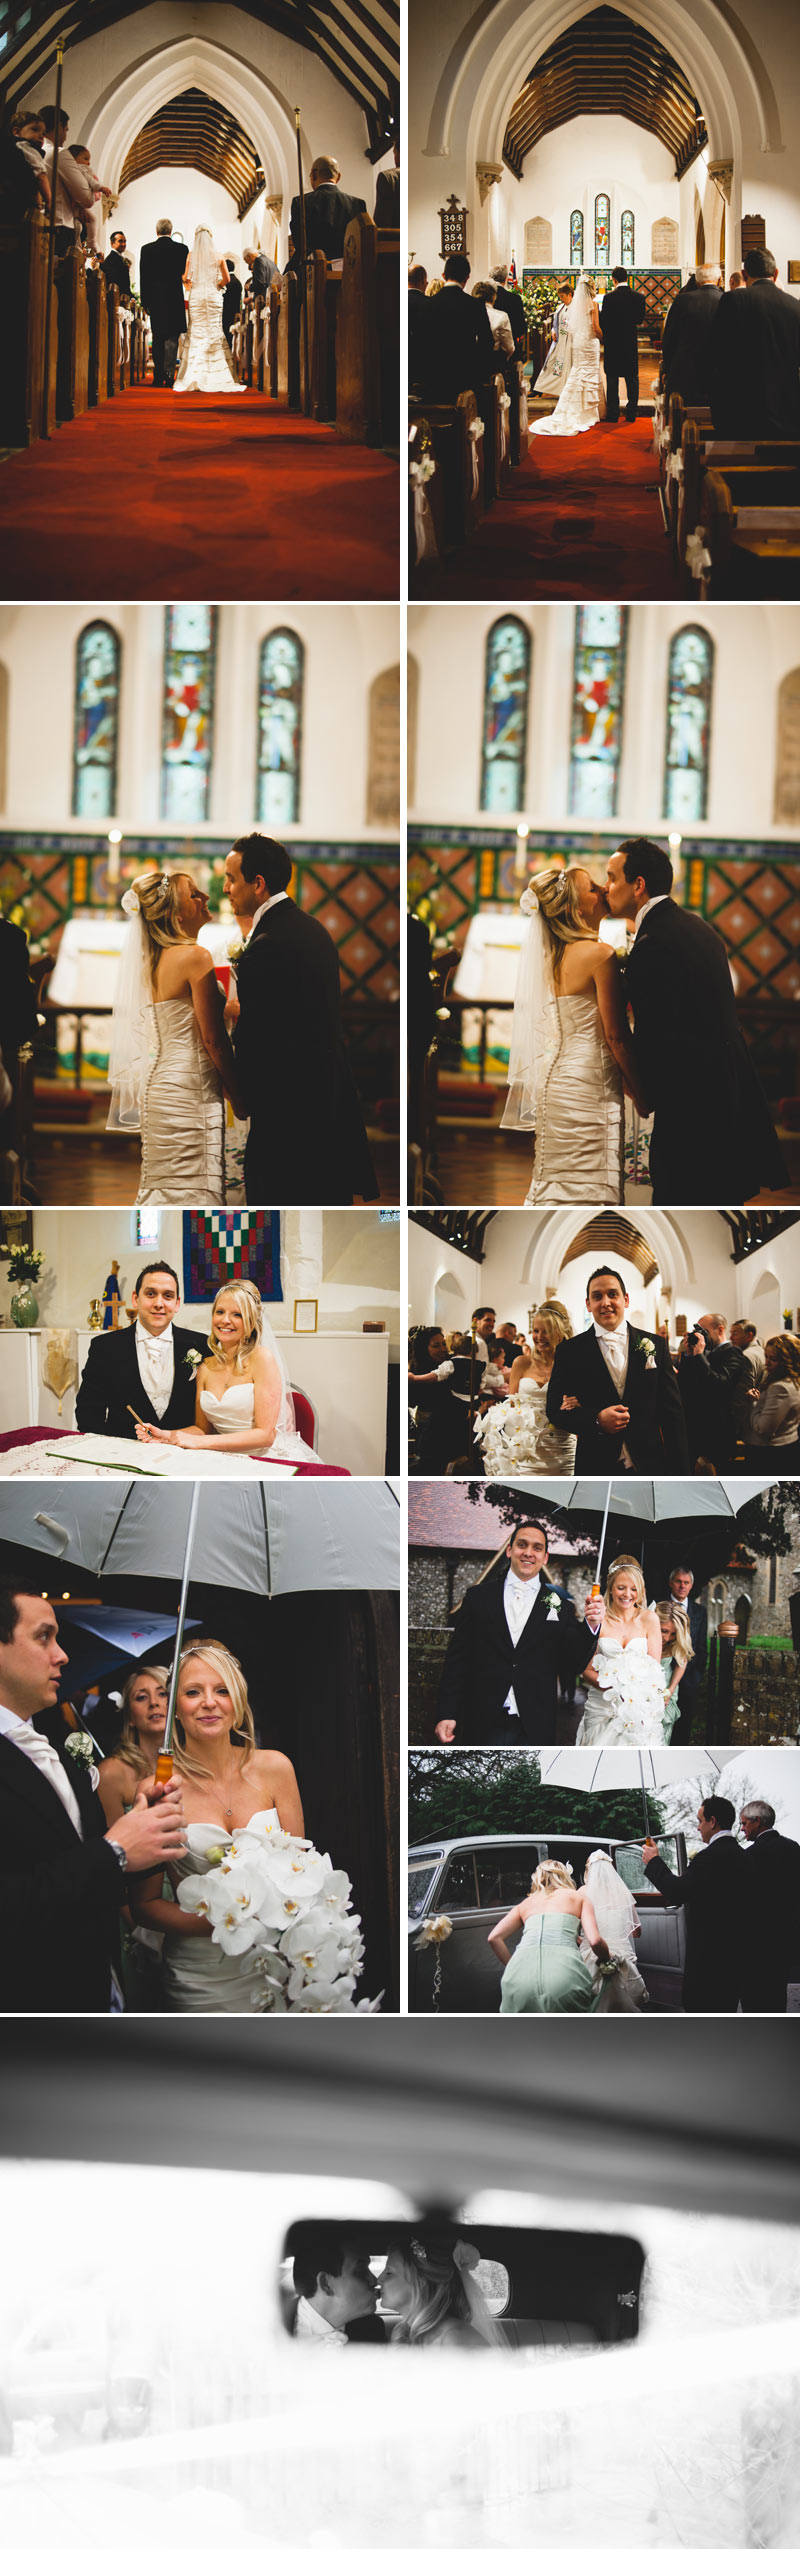 The Barnyard - Upchurch wedding photography